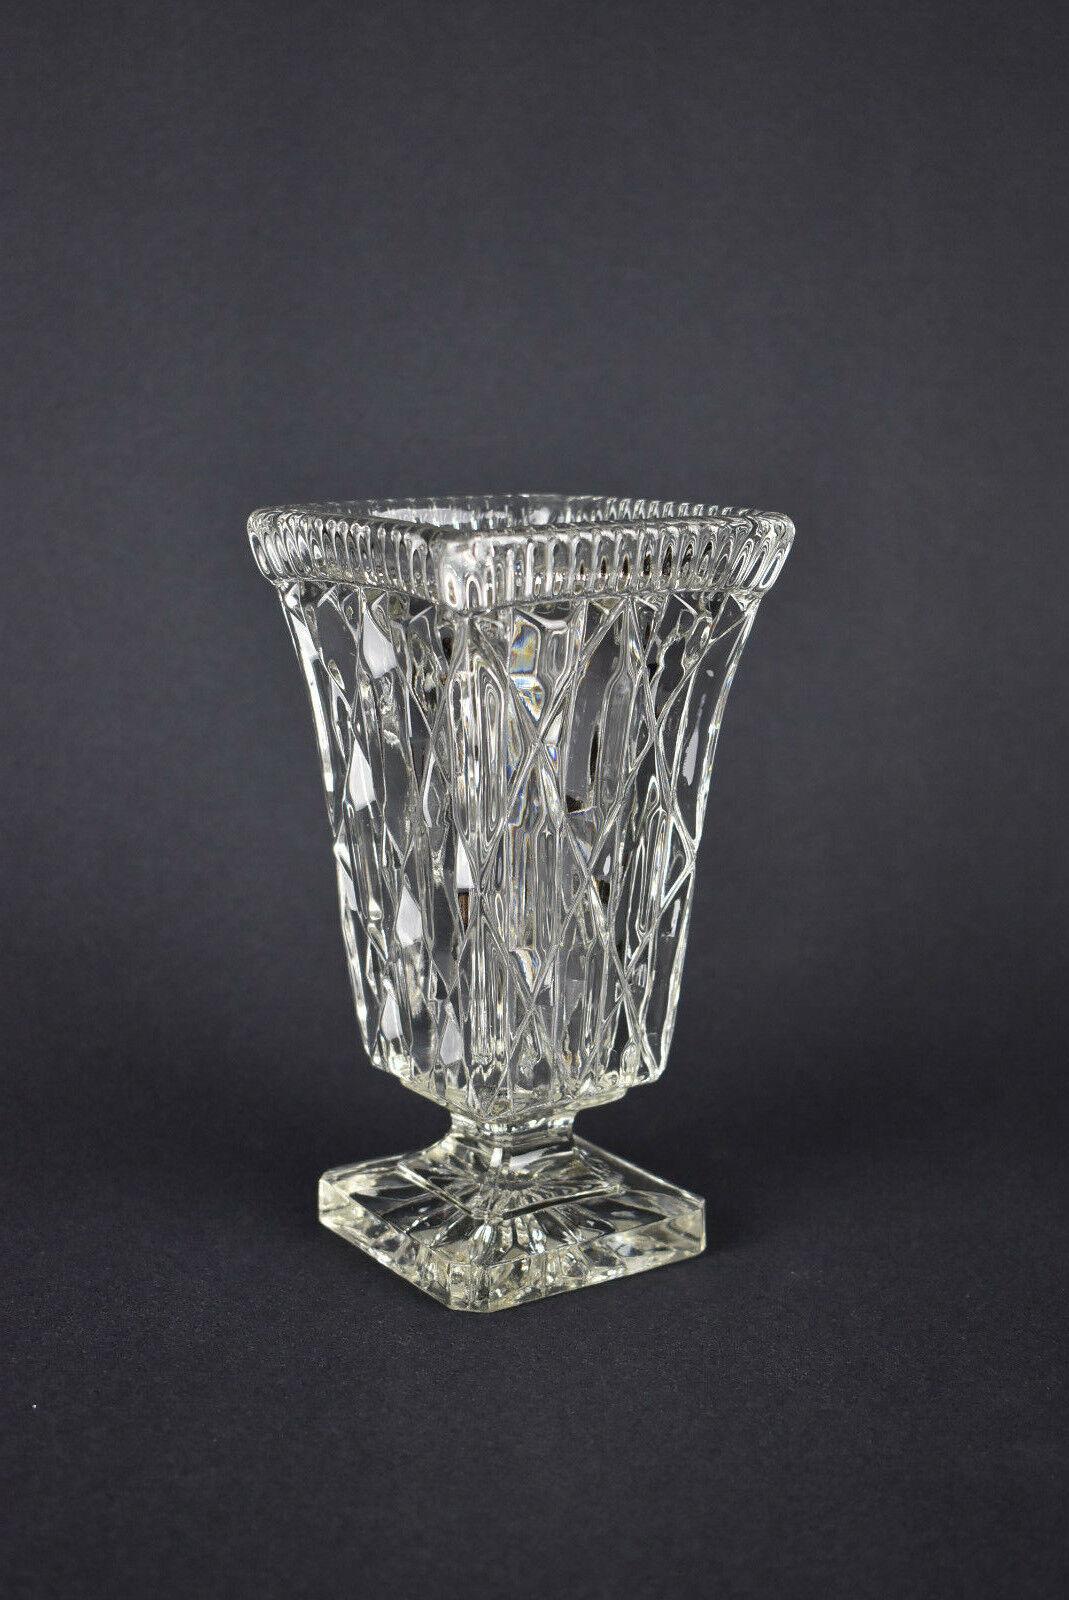 Vintage Czech / Bohemian Cut Crystal Glass Pedestal Vase